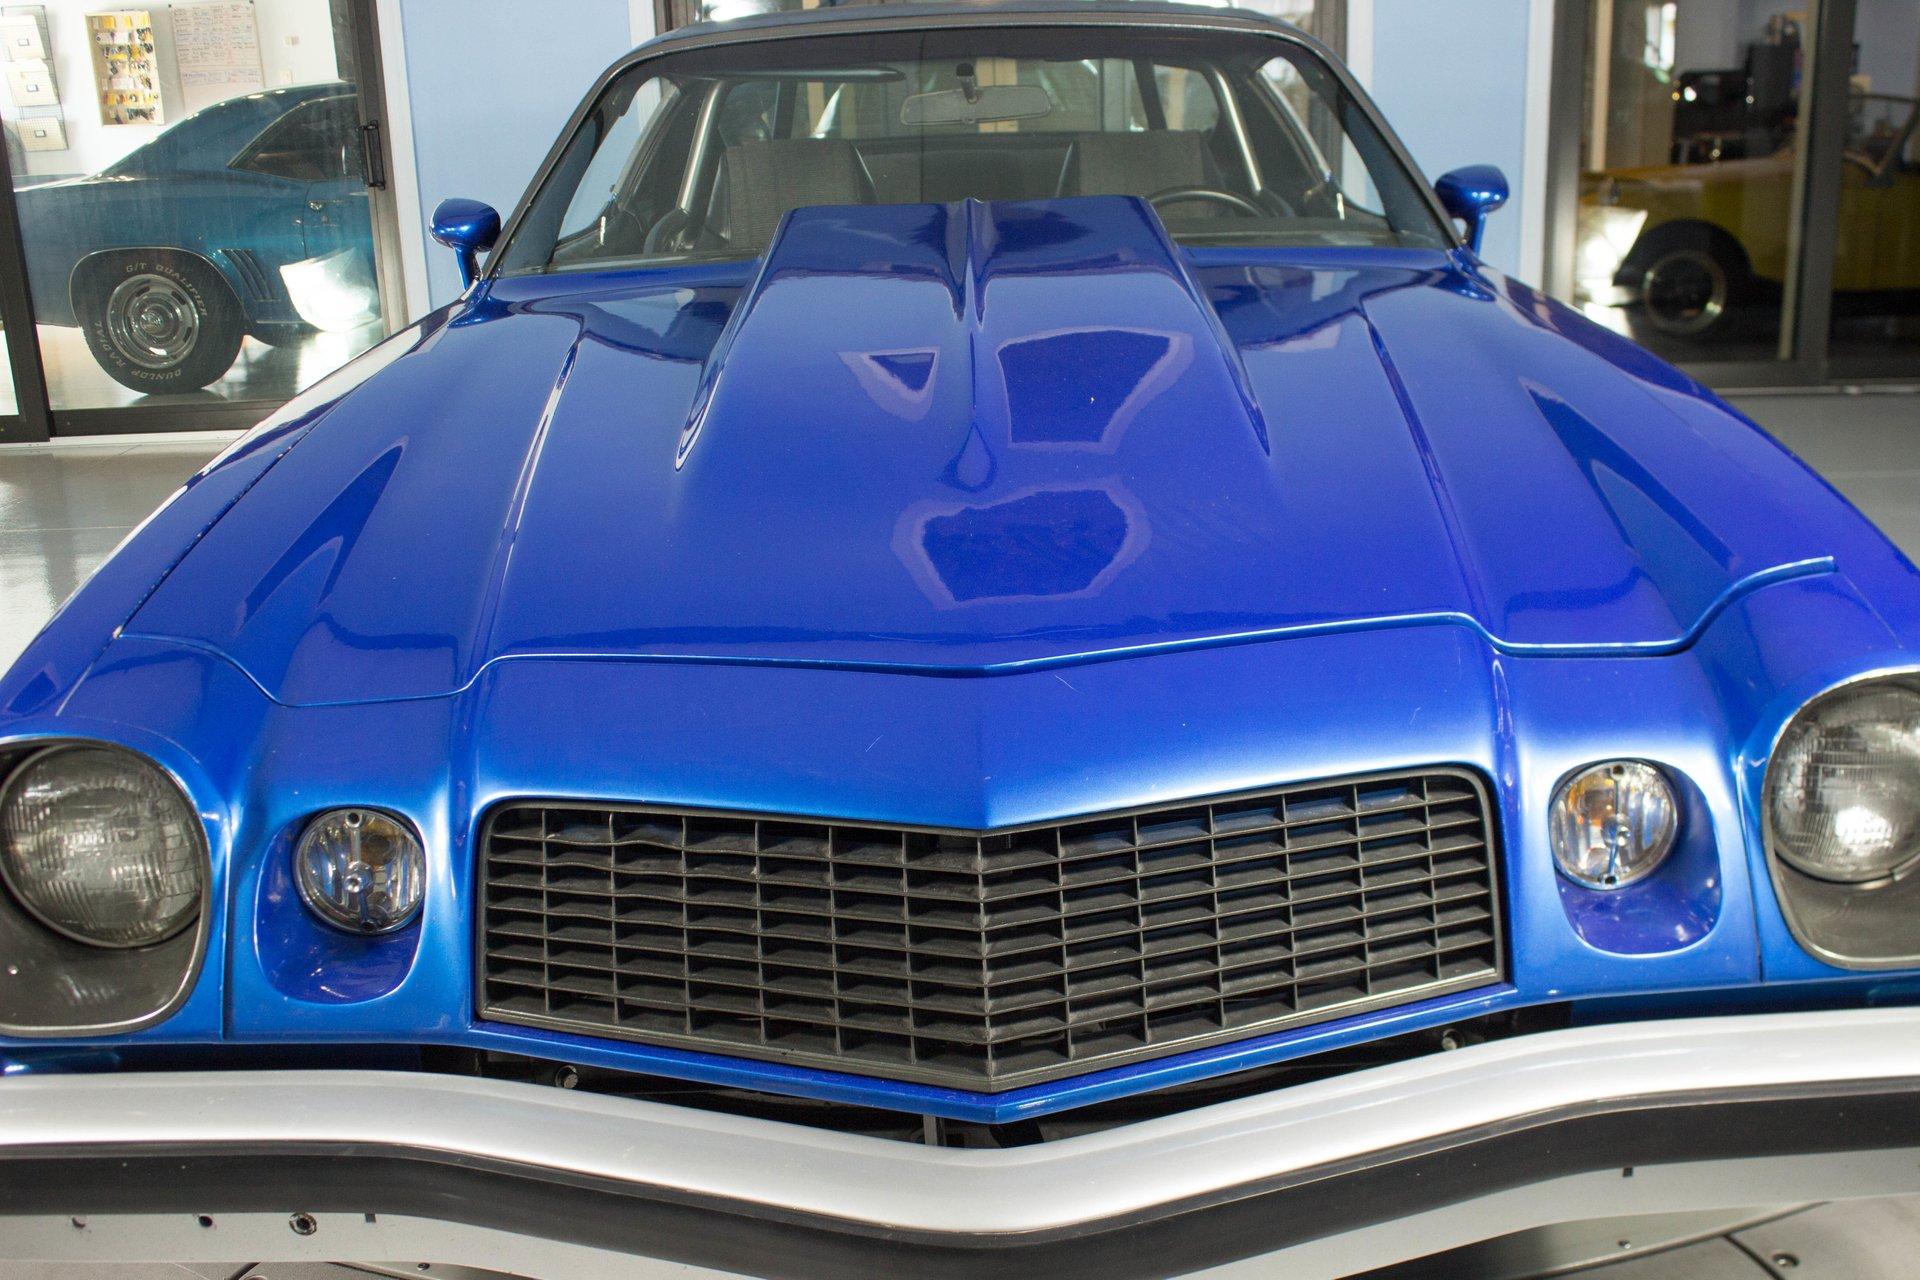 1974 Chevrolet Camaro Pro-Street | Classic Cars & Used Cars